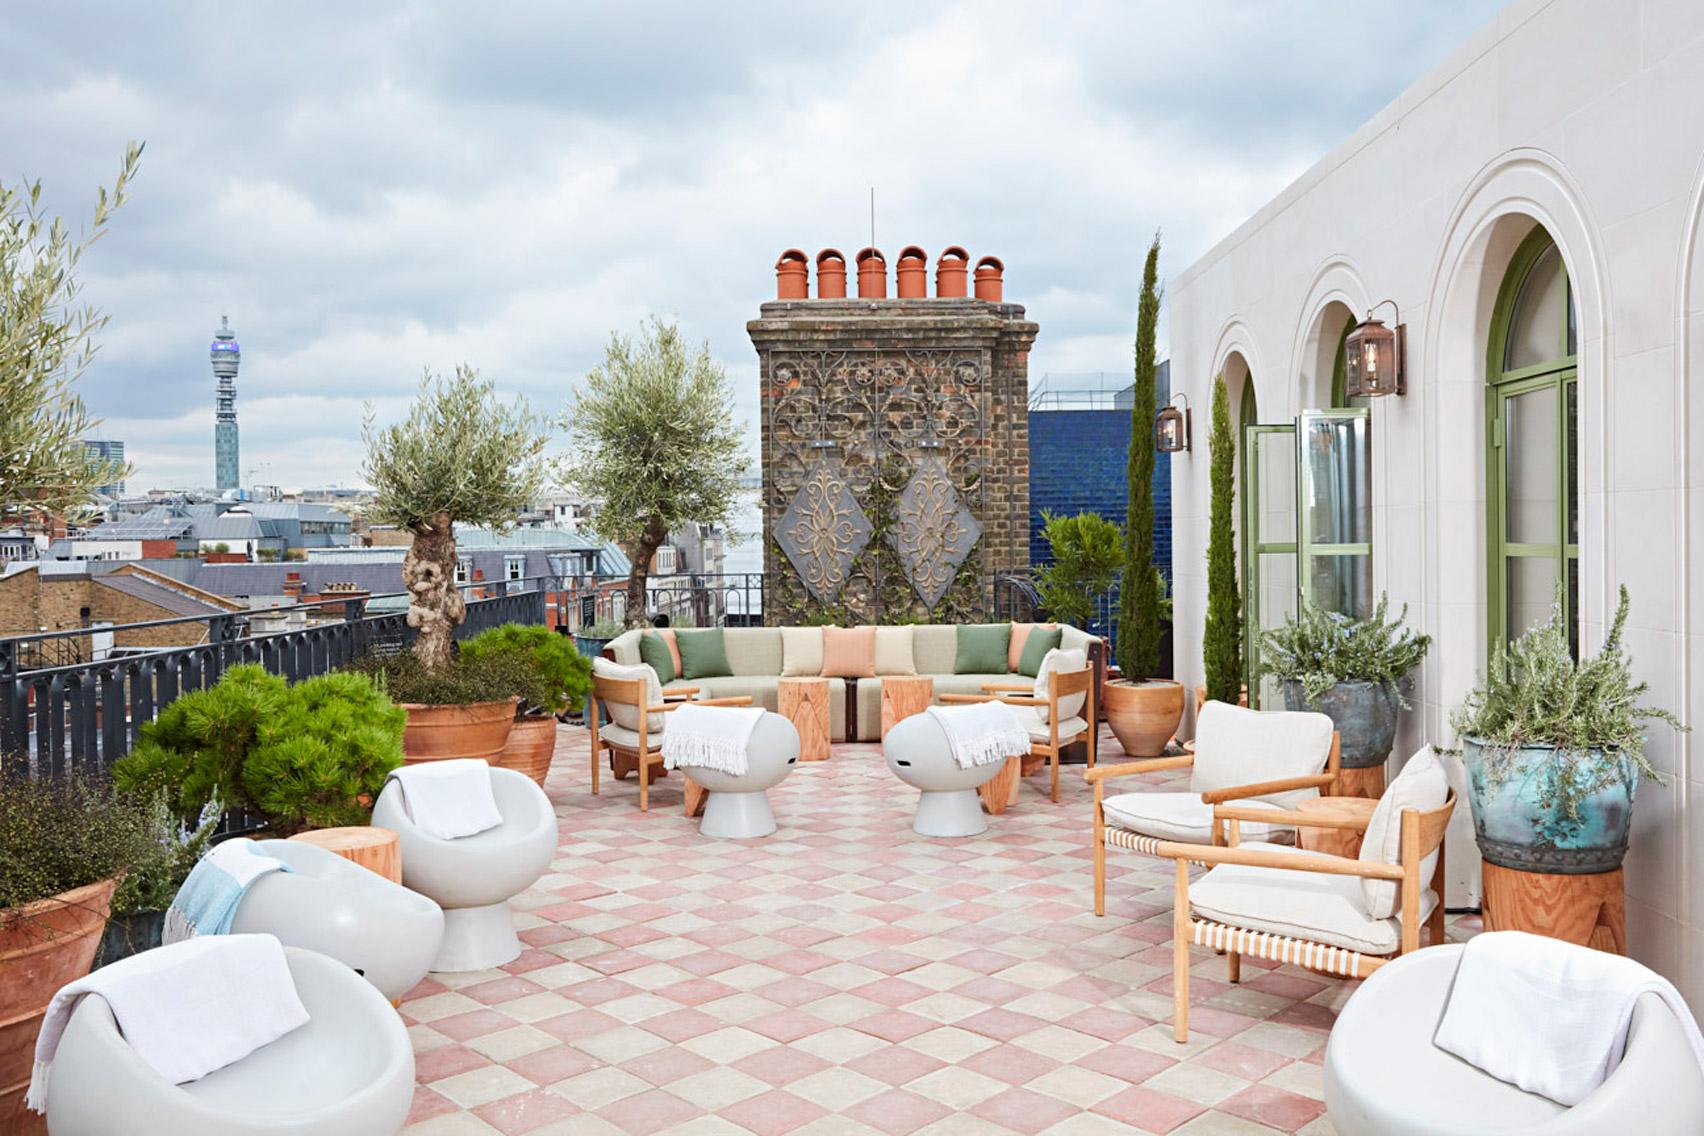 Roof terrace of The Conduit members club in London, UK